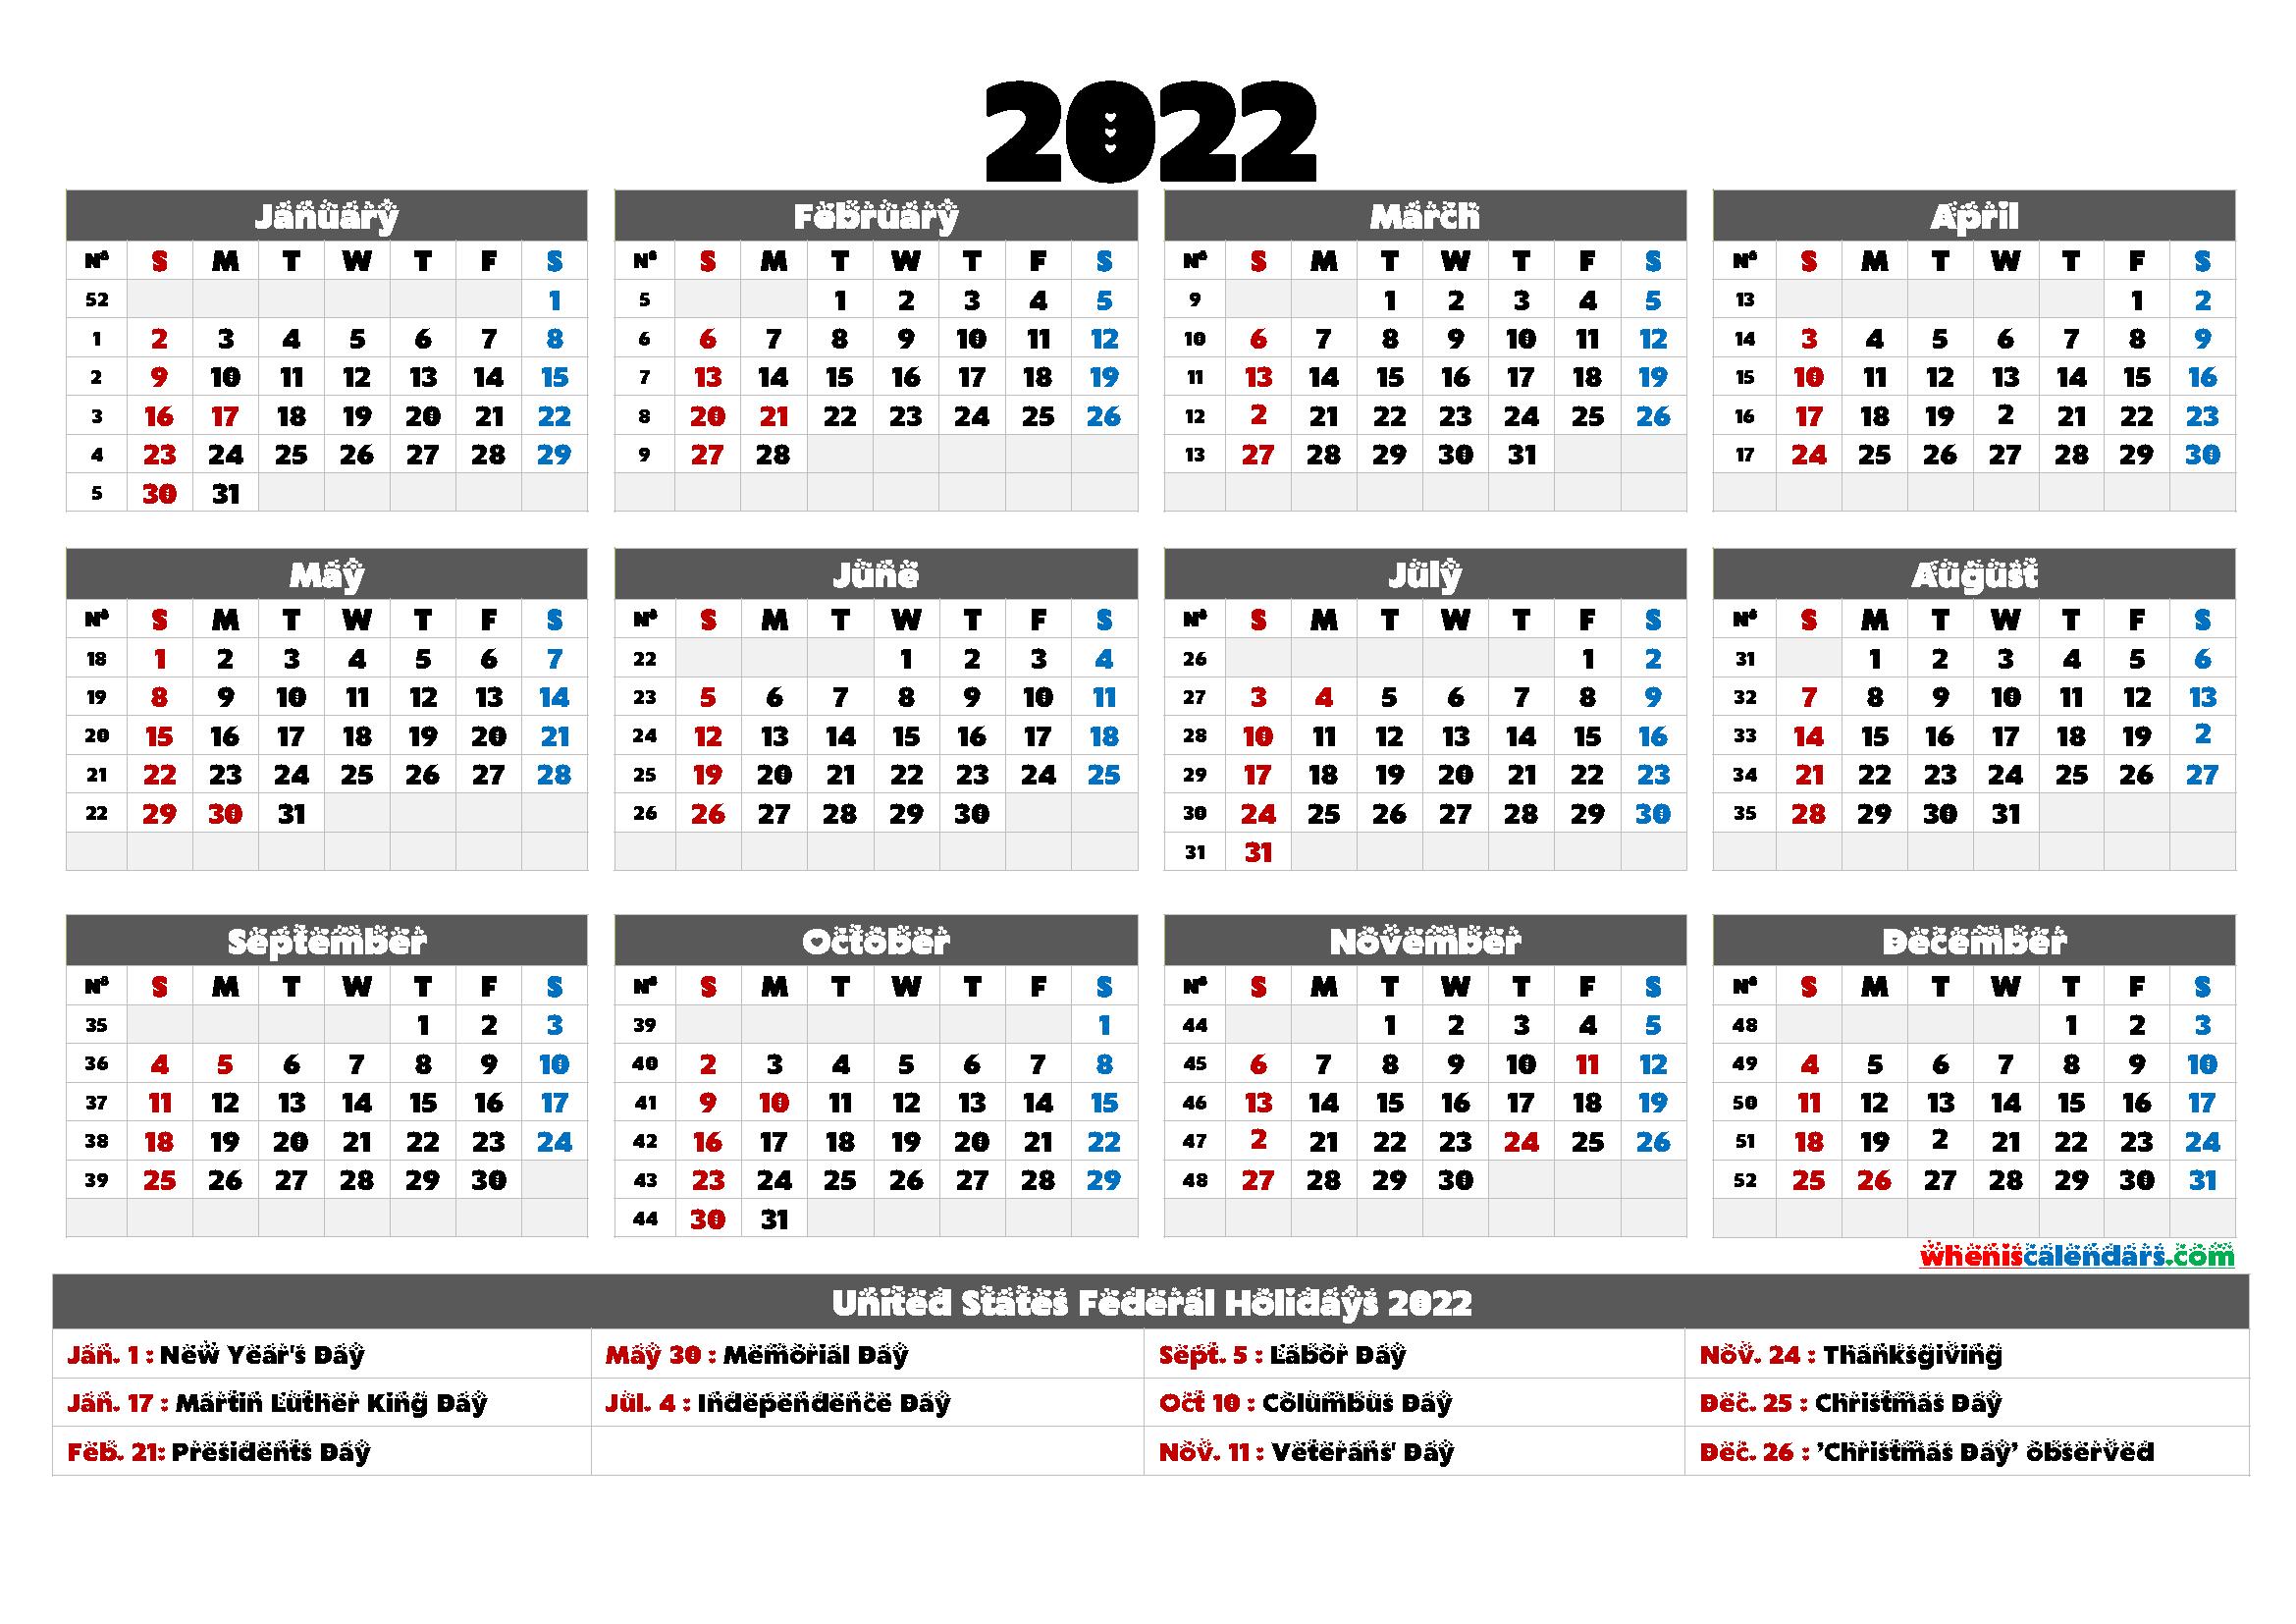 Work Week Calendar 2022.Printable 2022 Calendar With Holidays 6 Templates Calendar Printables Free Printable Calendar Templates Printable Free